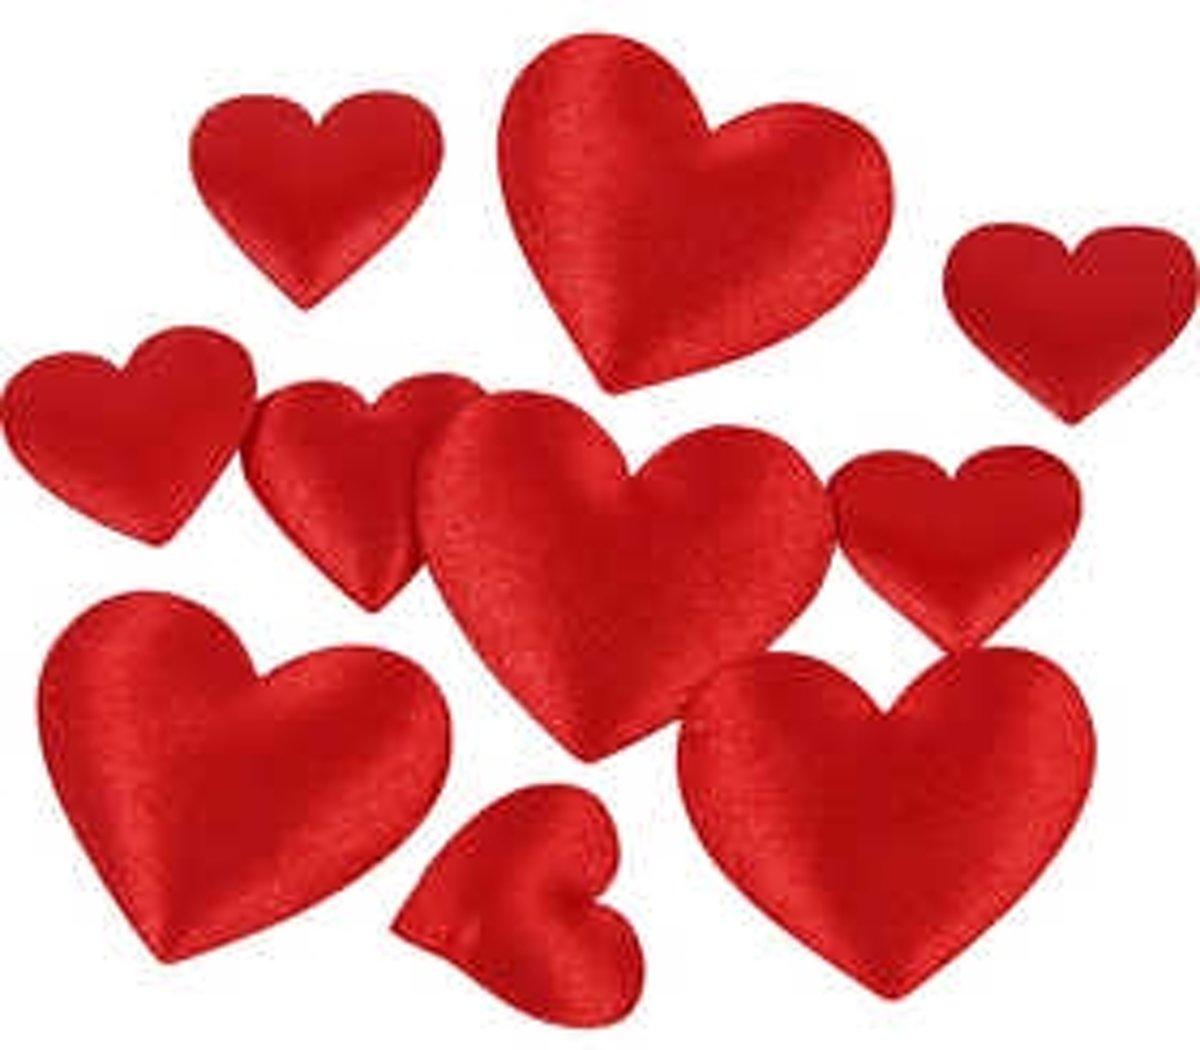 Satijnen harten, afm 10+20 mm, dikte 1-2 mm, rood, 700div [HOB-52112] kopen